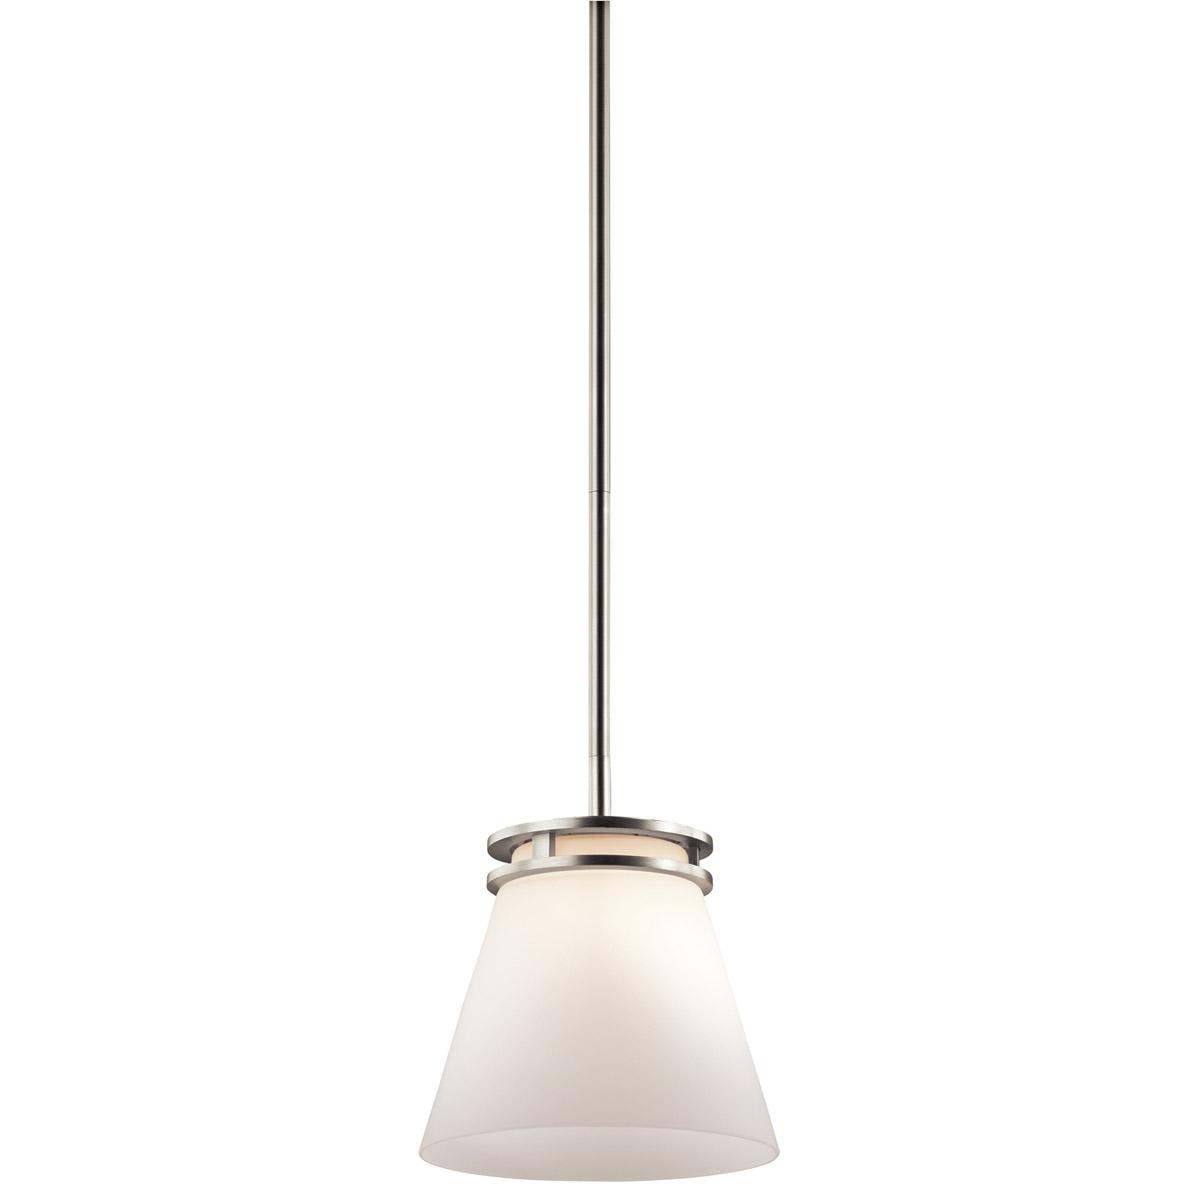 Lighting Warehouse Hendrik Potgieter: Kichler Lighting 1687NI Hendrik Pendant Brushed Nickel